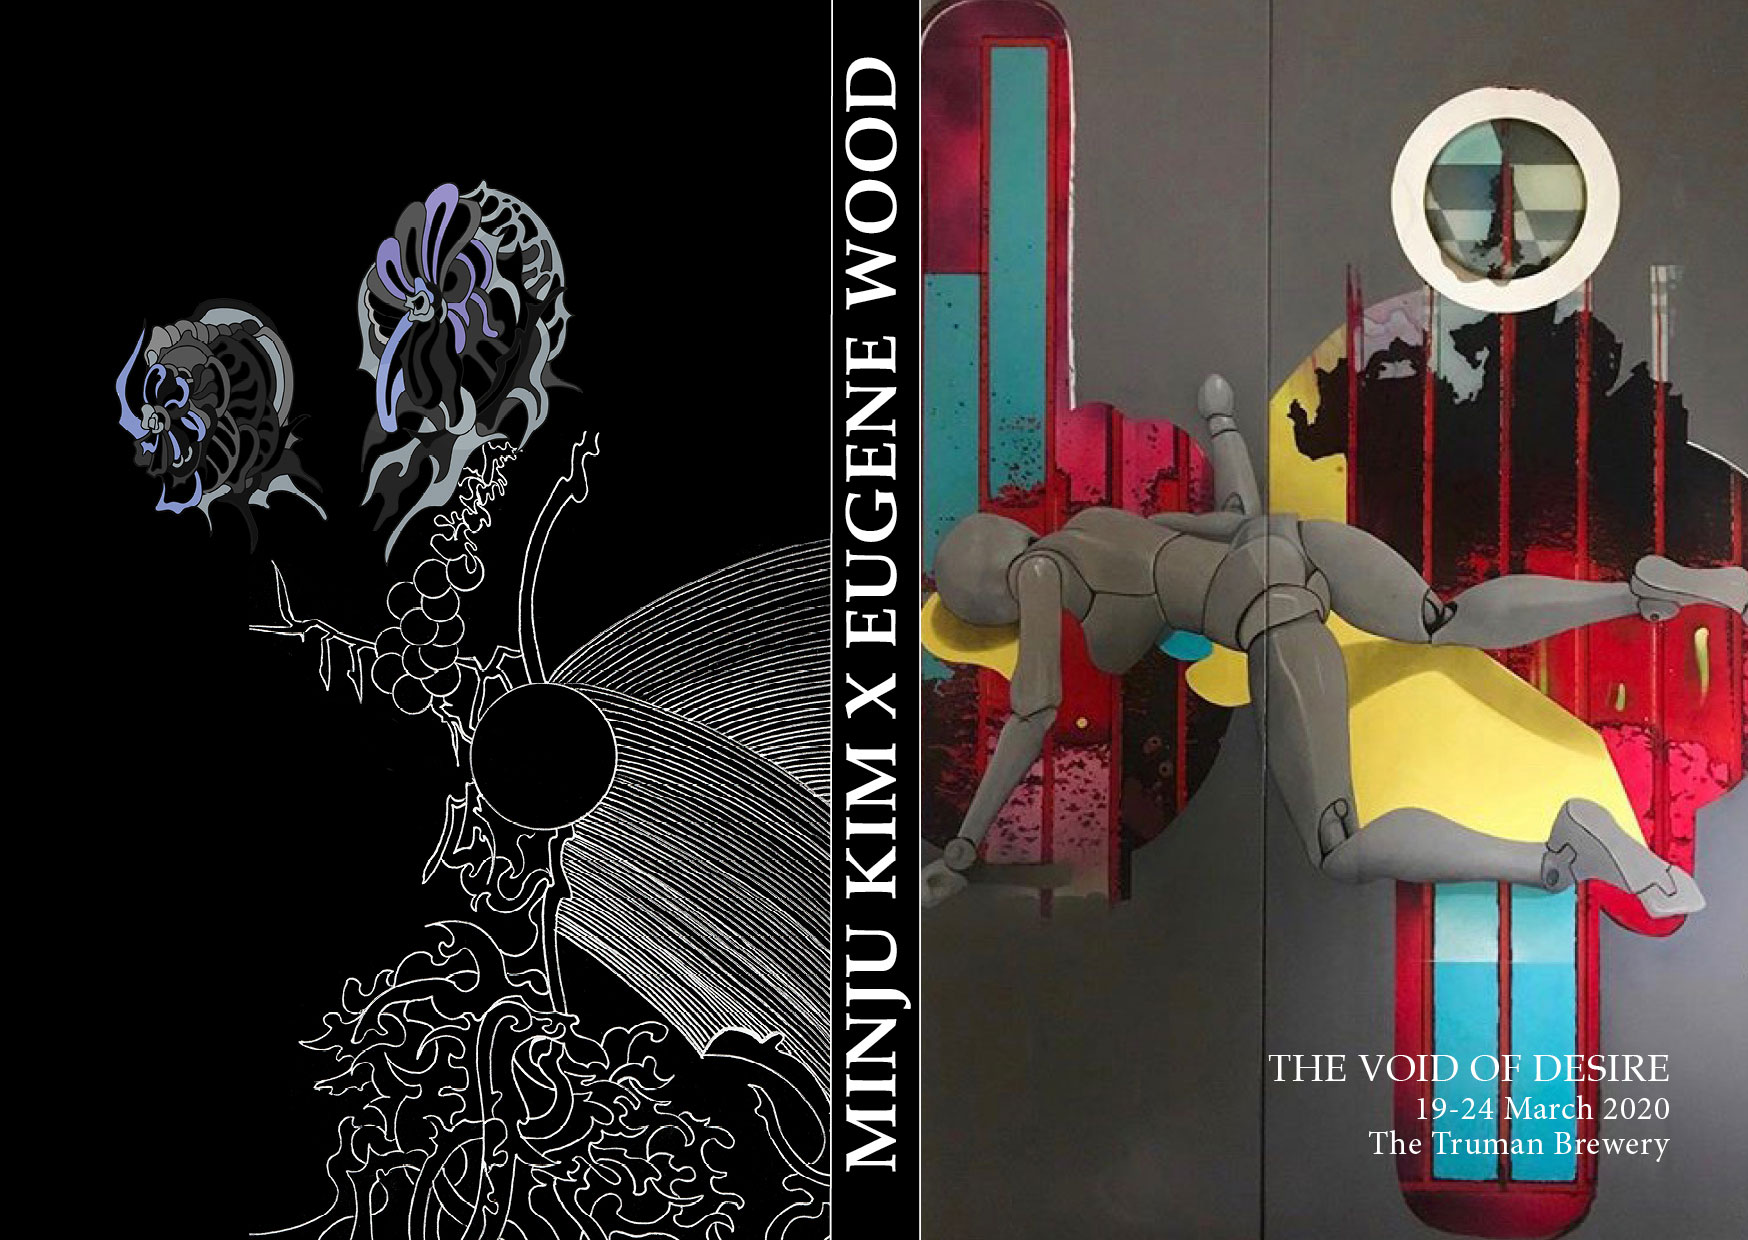 The Void of Desire: Minju Kim X Eugene Wood